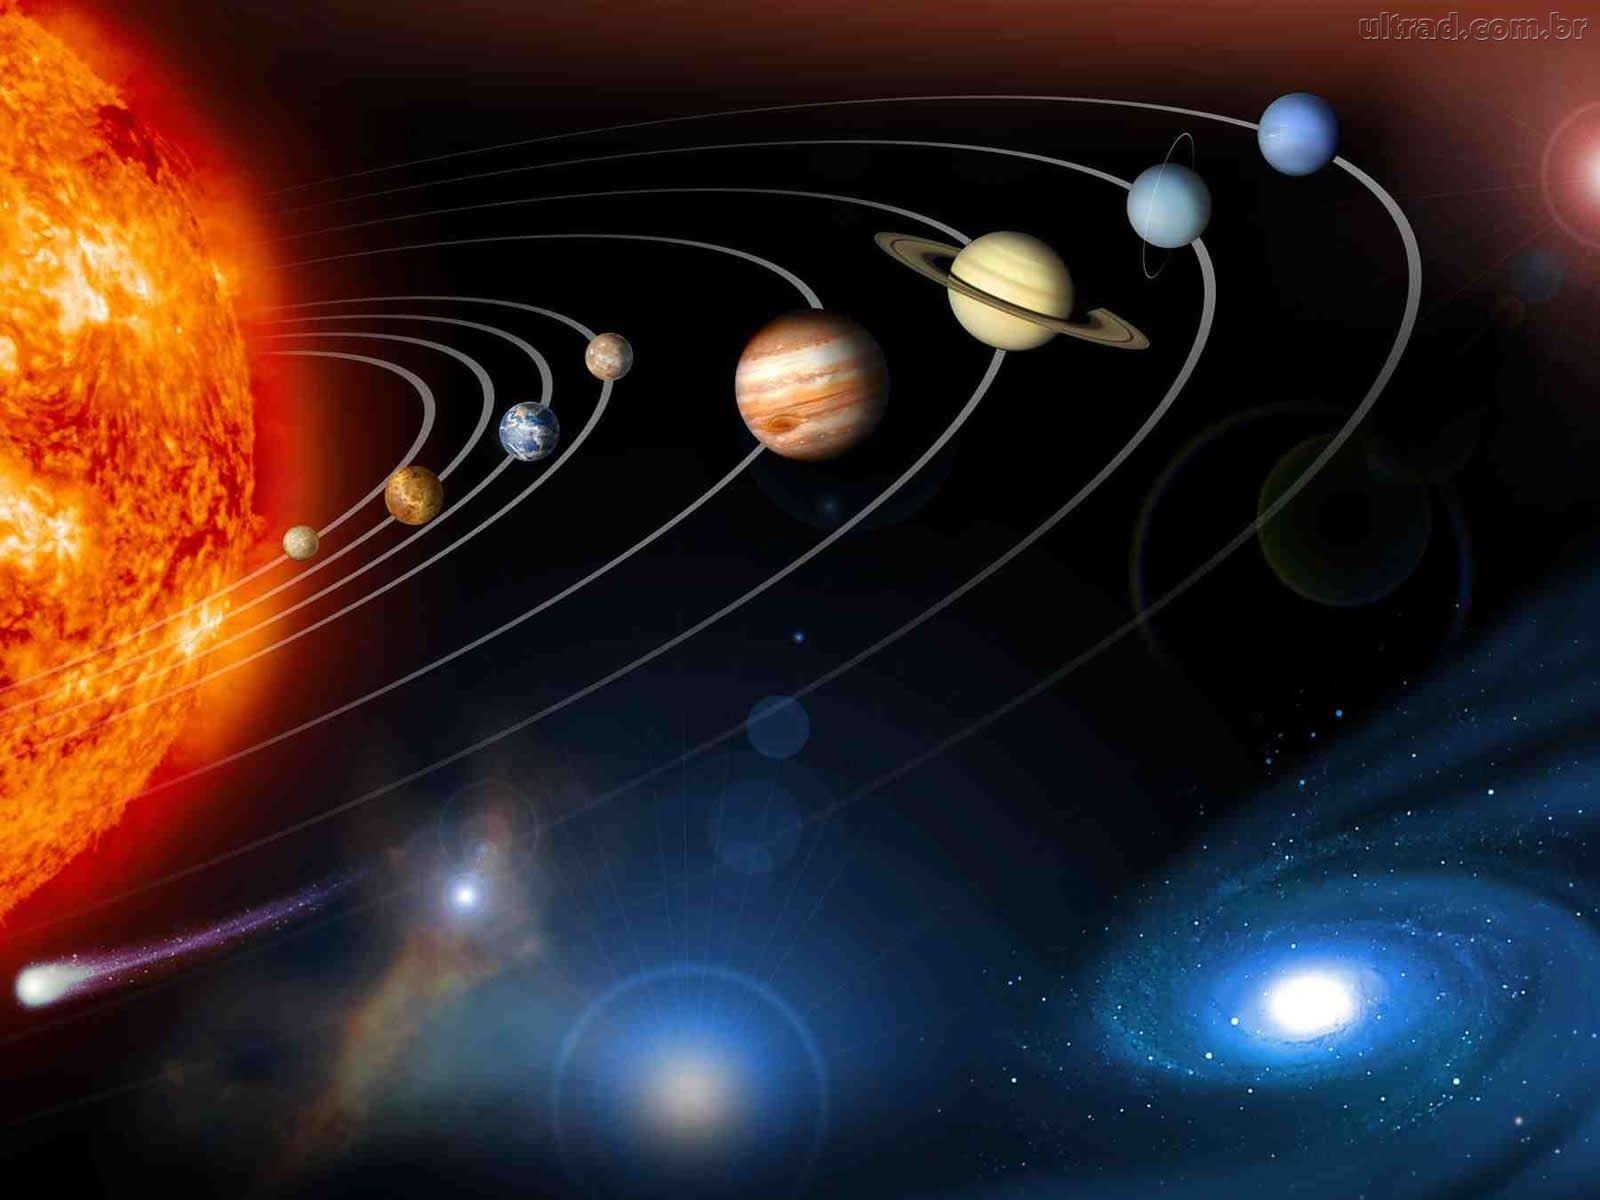 47335_Papel-de-Parede-Sistema-Solar_1600x1200